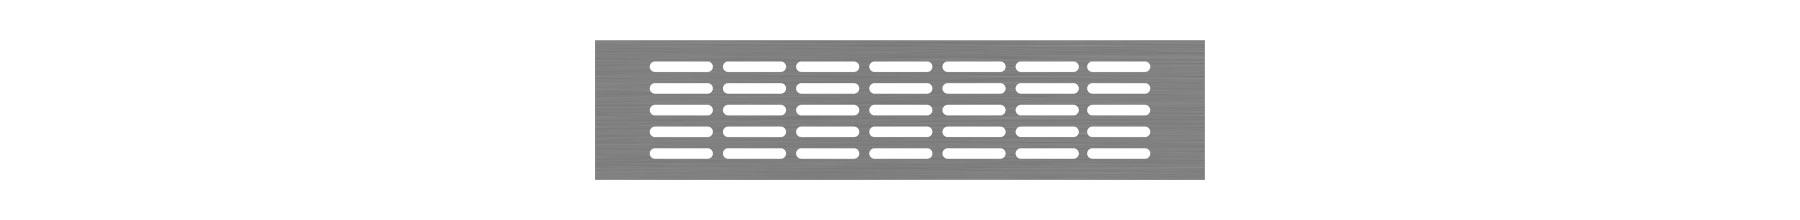 VRS-003 - Ventilaciona rešetka 66×290 mm